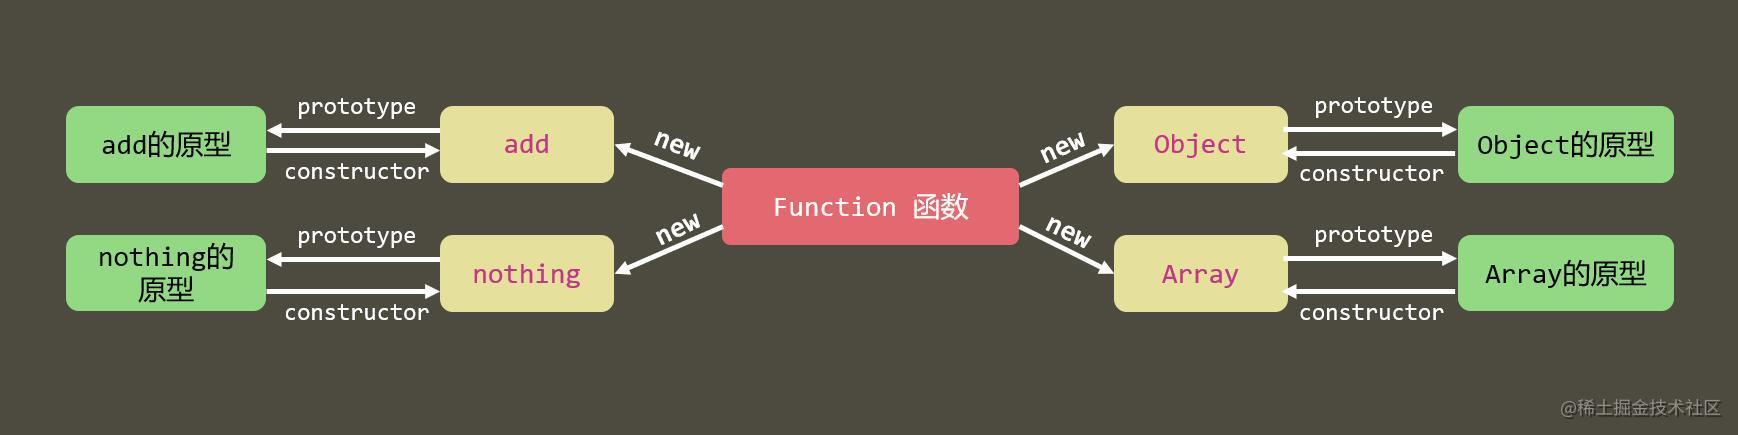 constructor.jfif